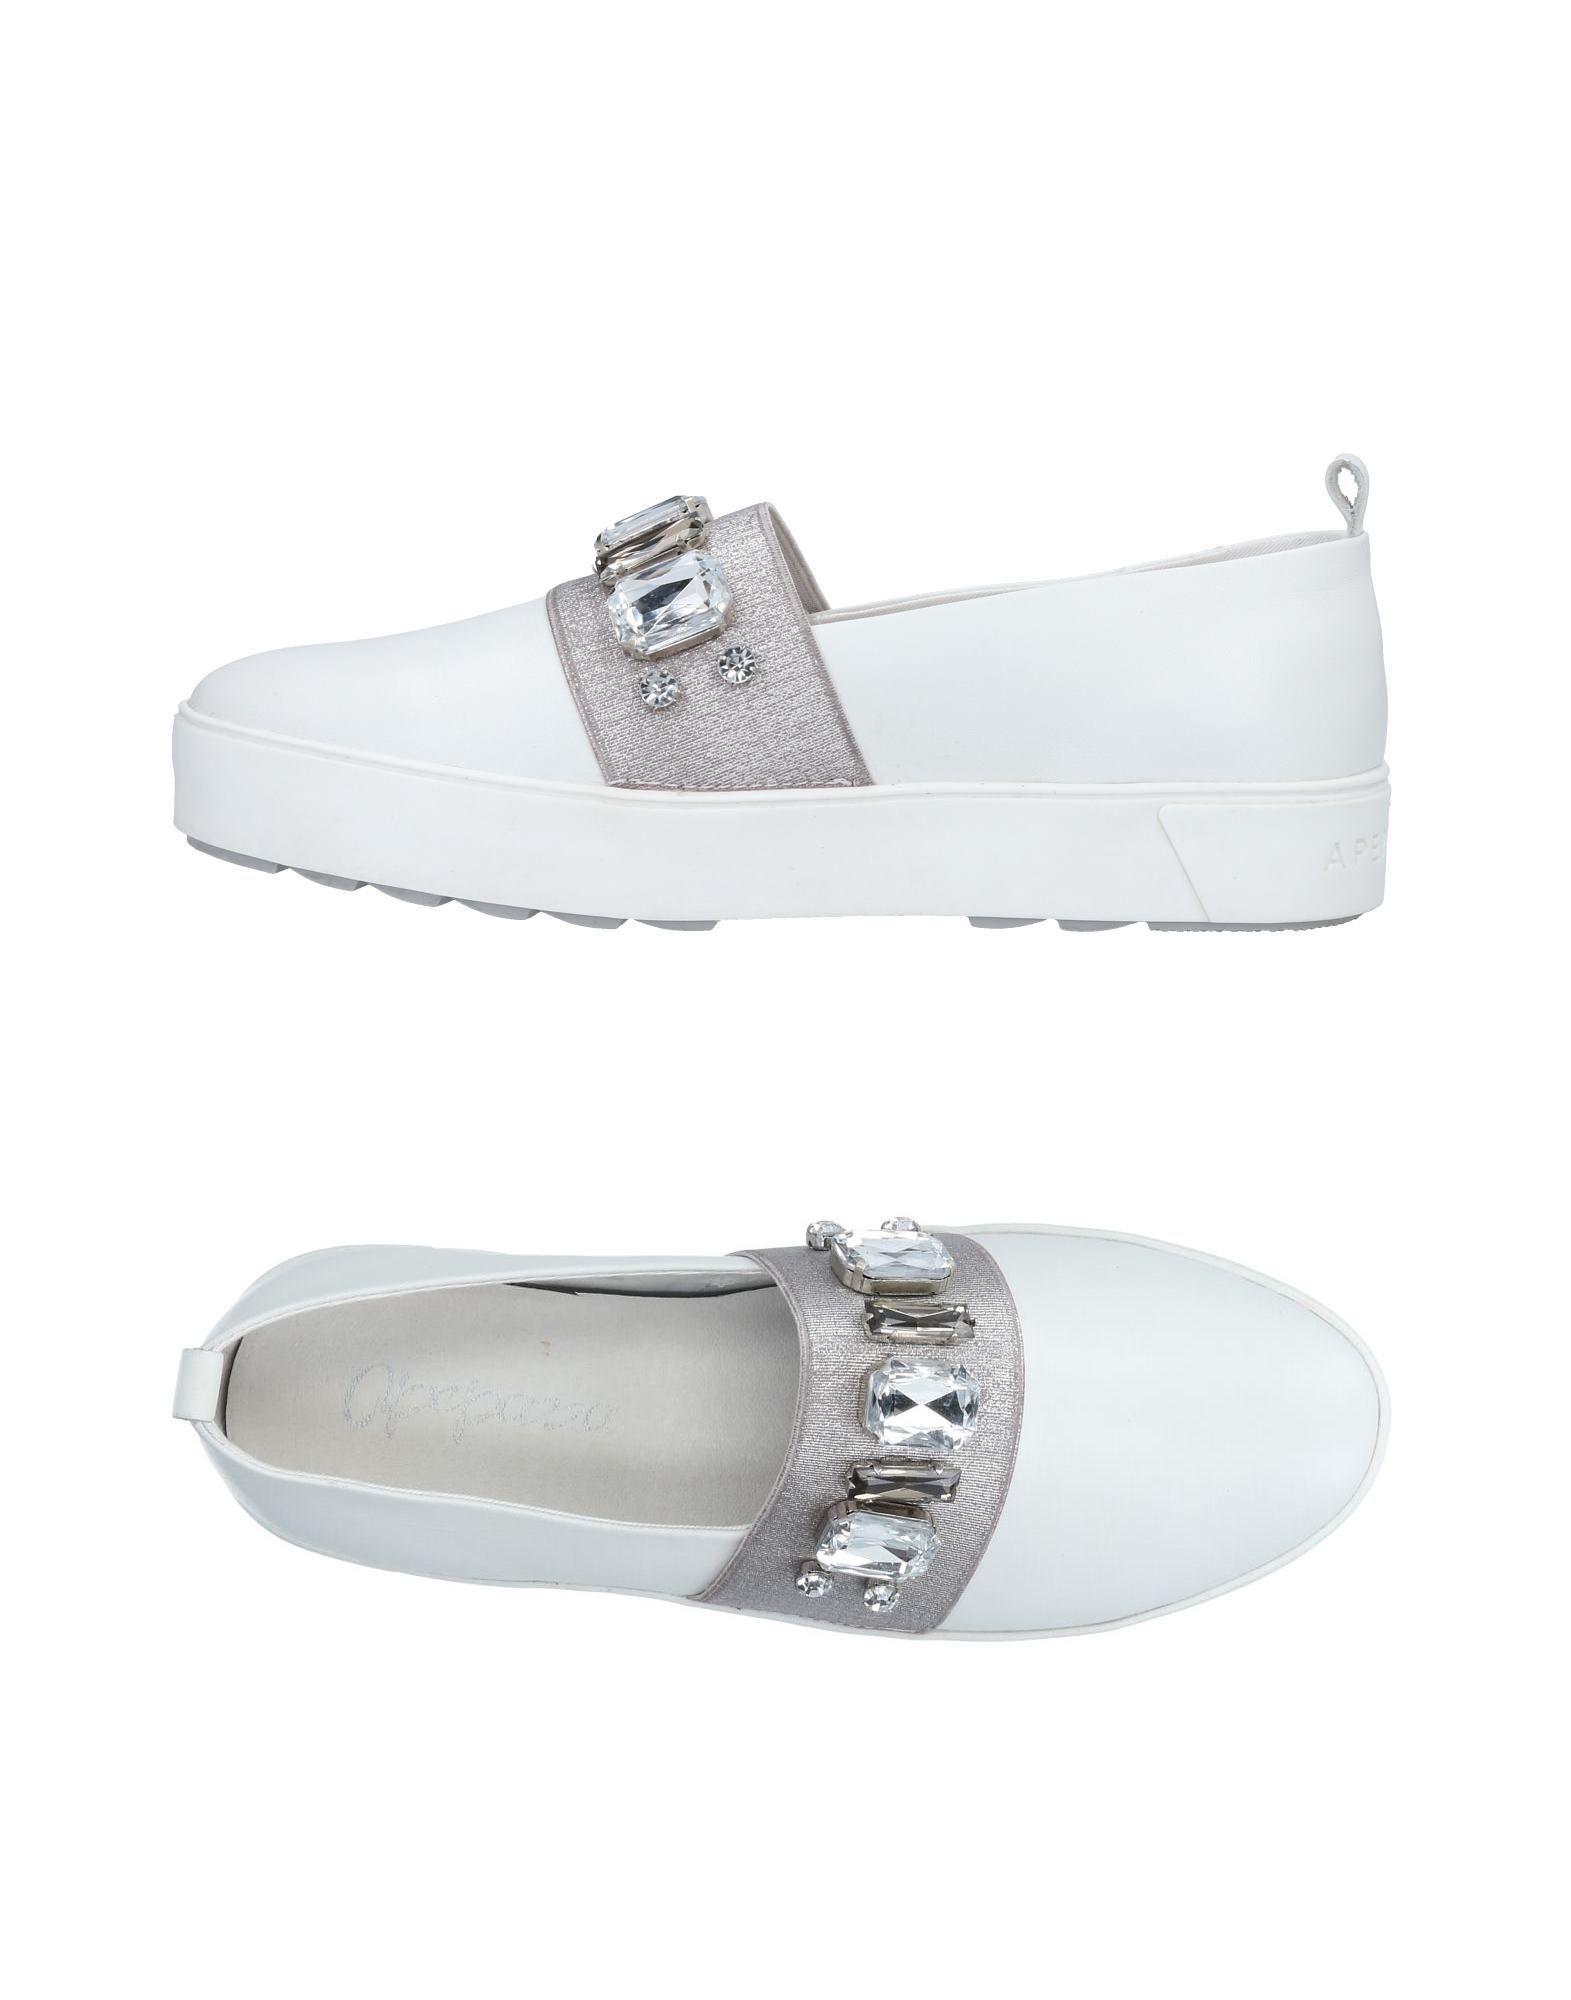 Apepazza Mokassins Damen  11481394KW Gute Qualität beliebte Schuhe